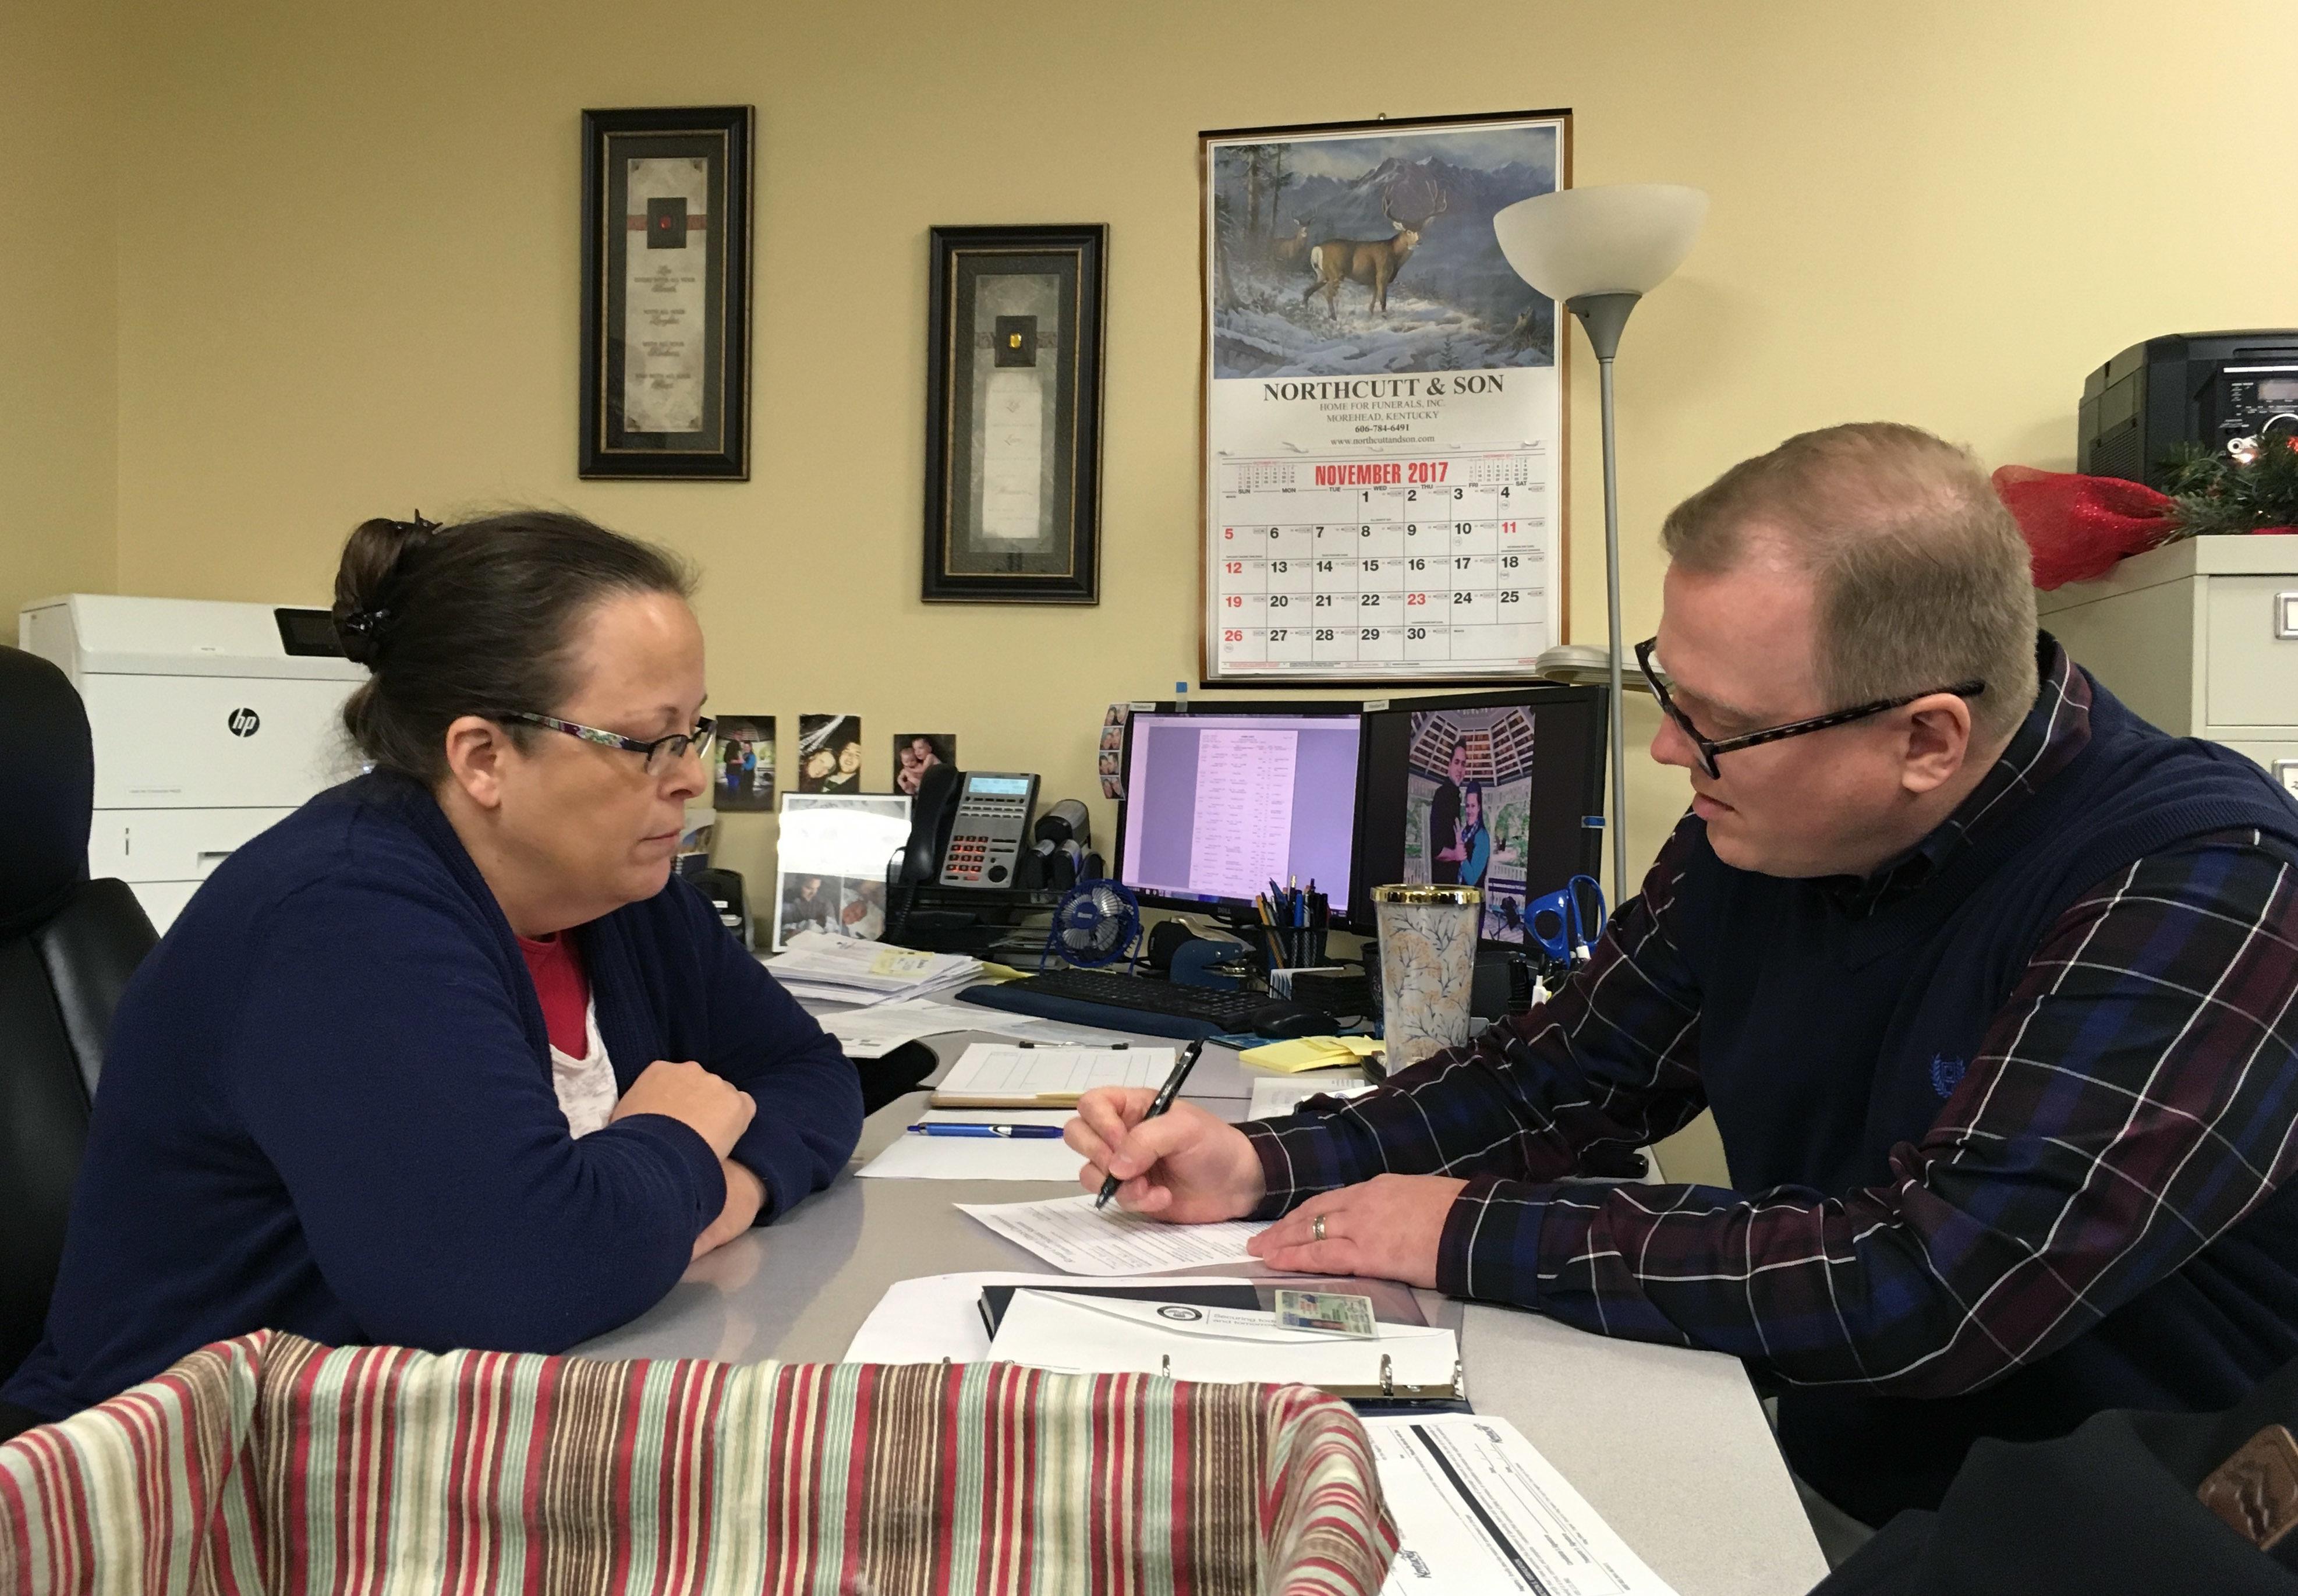 David Ermold, right, files to run for Rowan County Clerk in Kentucky as Clerk Kim Davis, left, looks on